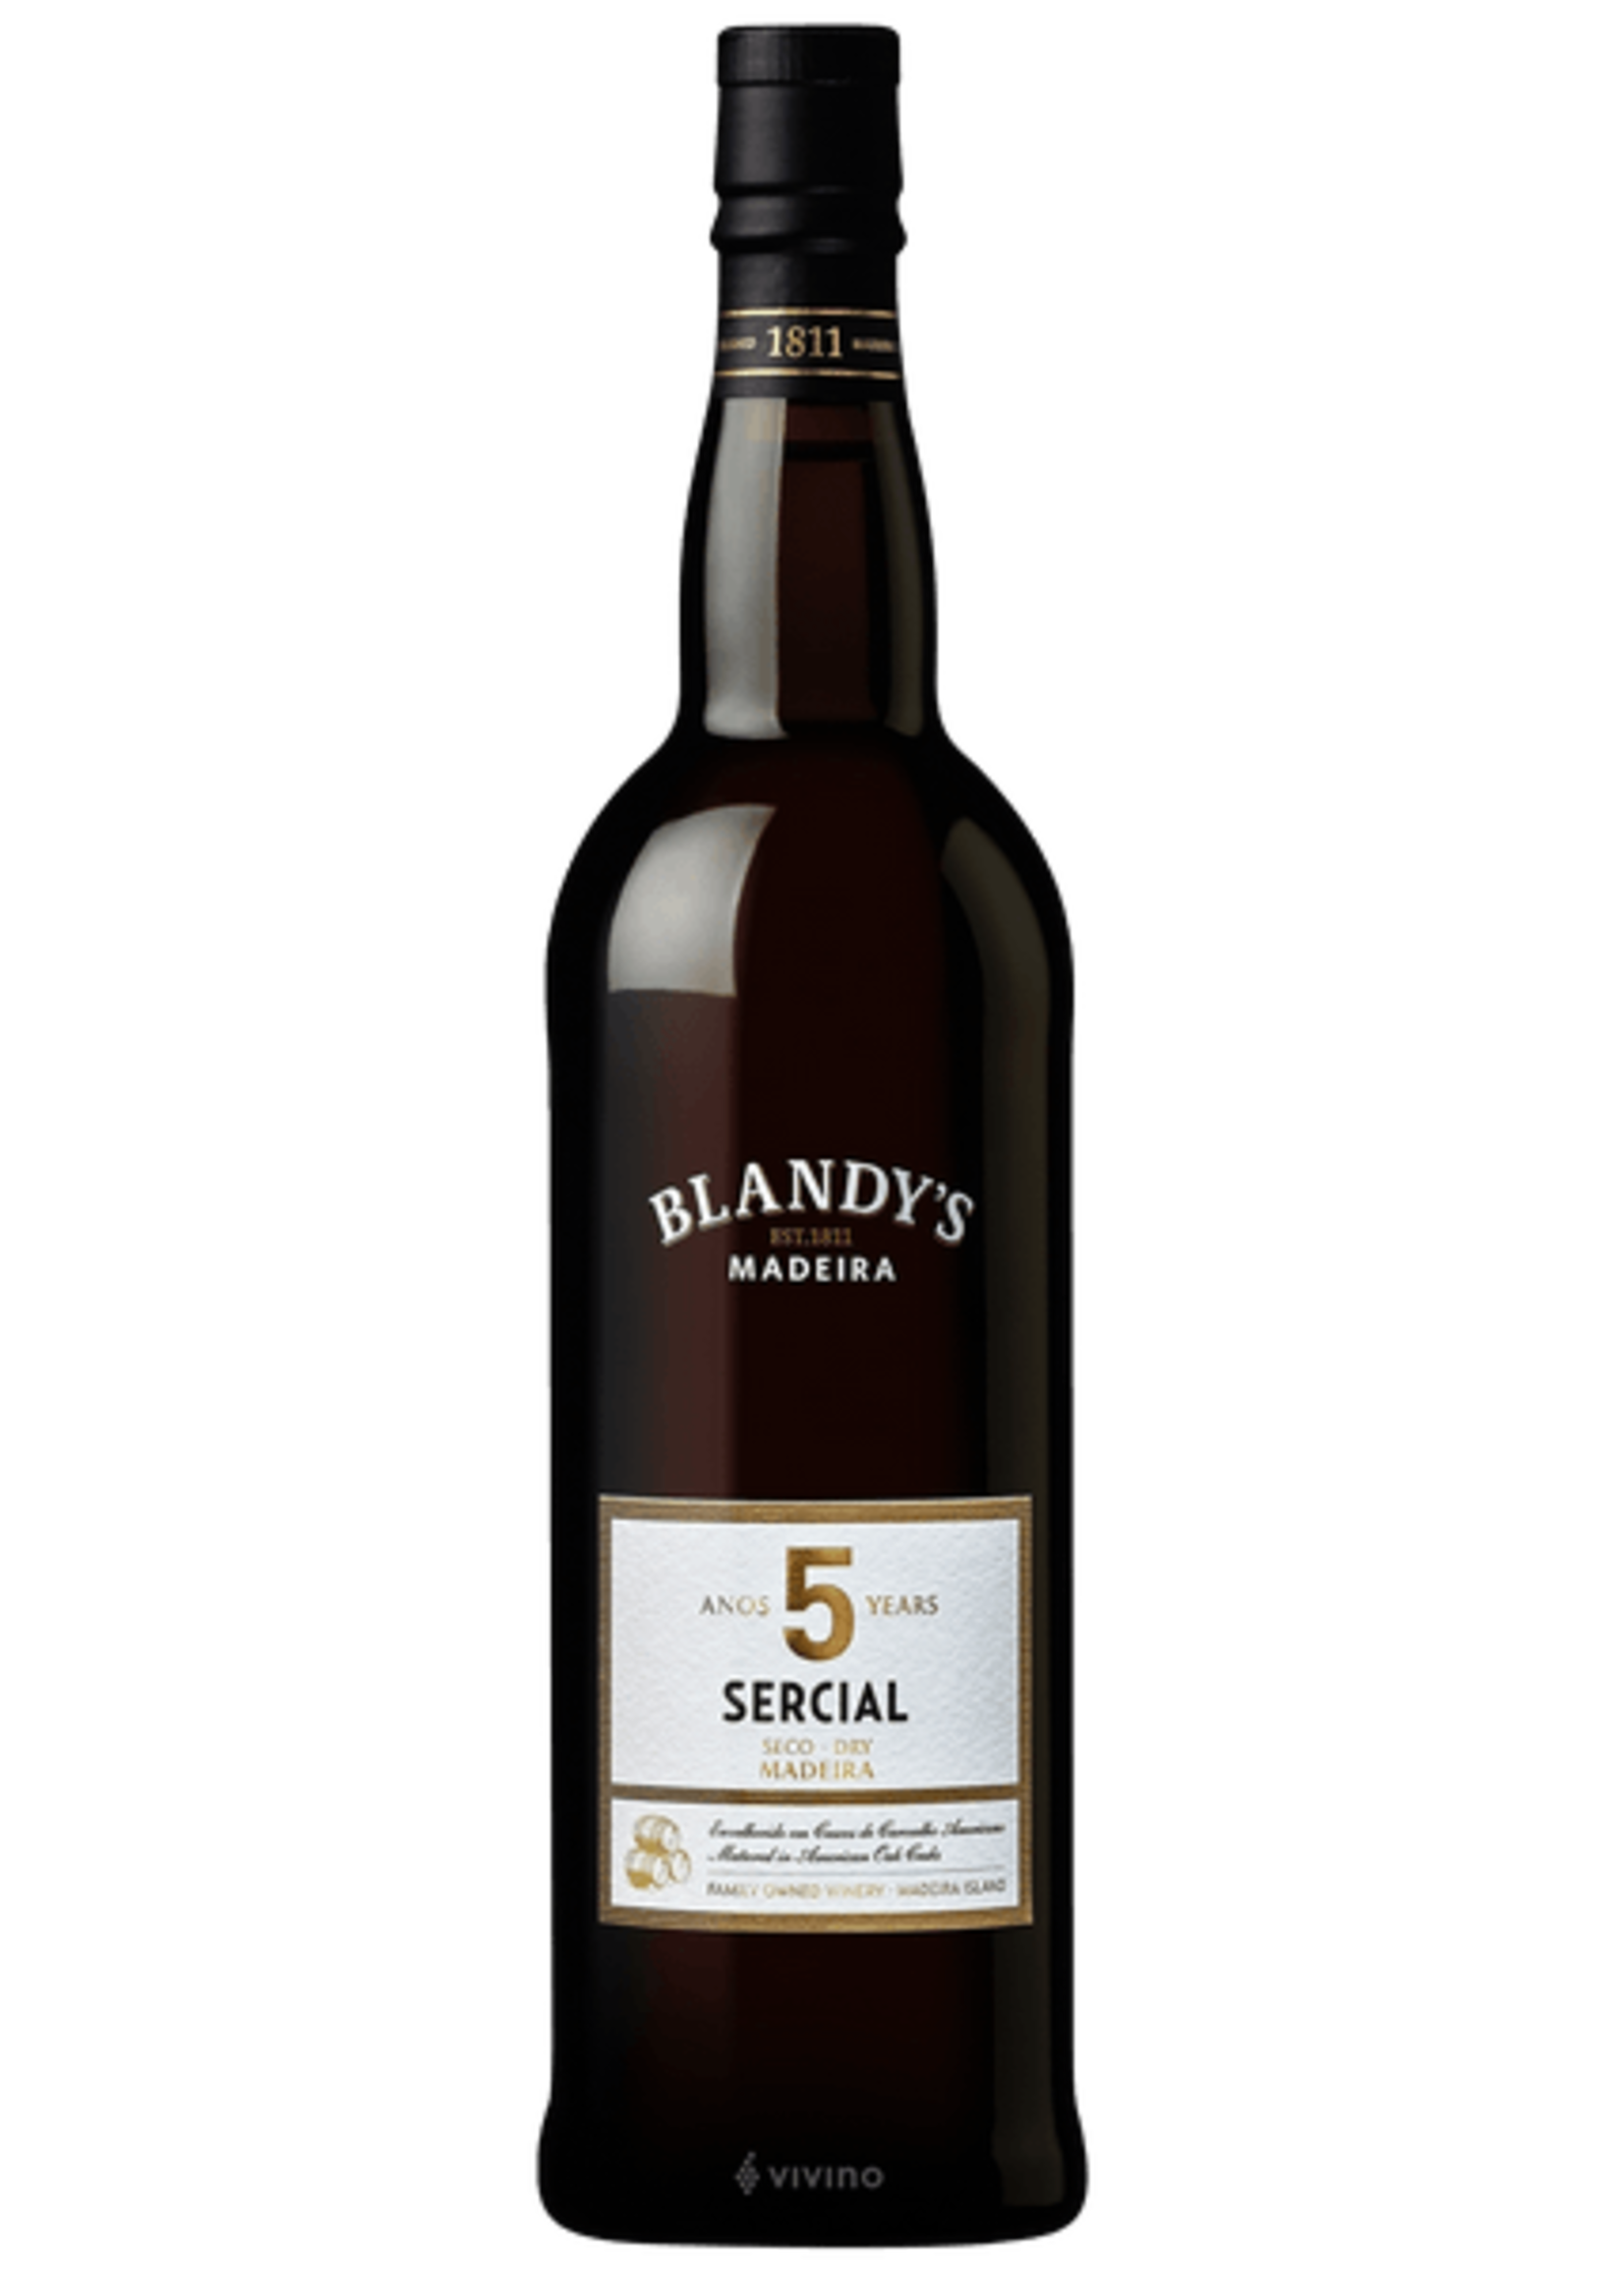 Blandy's Blandy's / Madeira Sercial 5 Year / 750mL